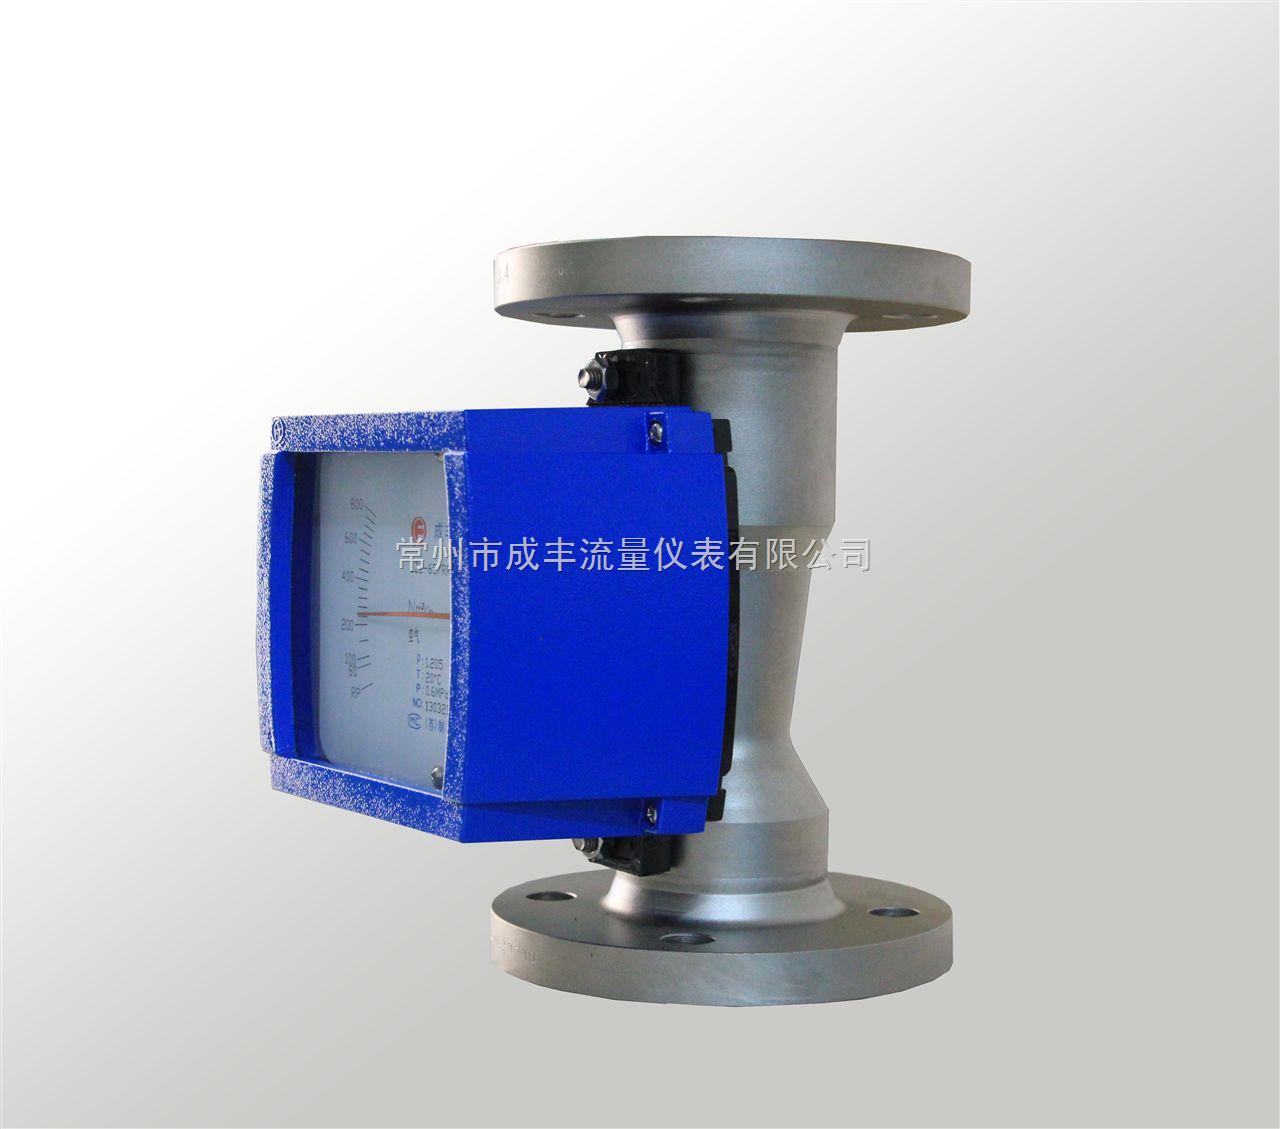 LZD-100-克羅尼結構的金屬浮子流量計【常州成豐】取代進口品牌。流量穩,精度高,價格低。